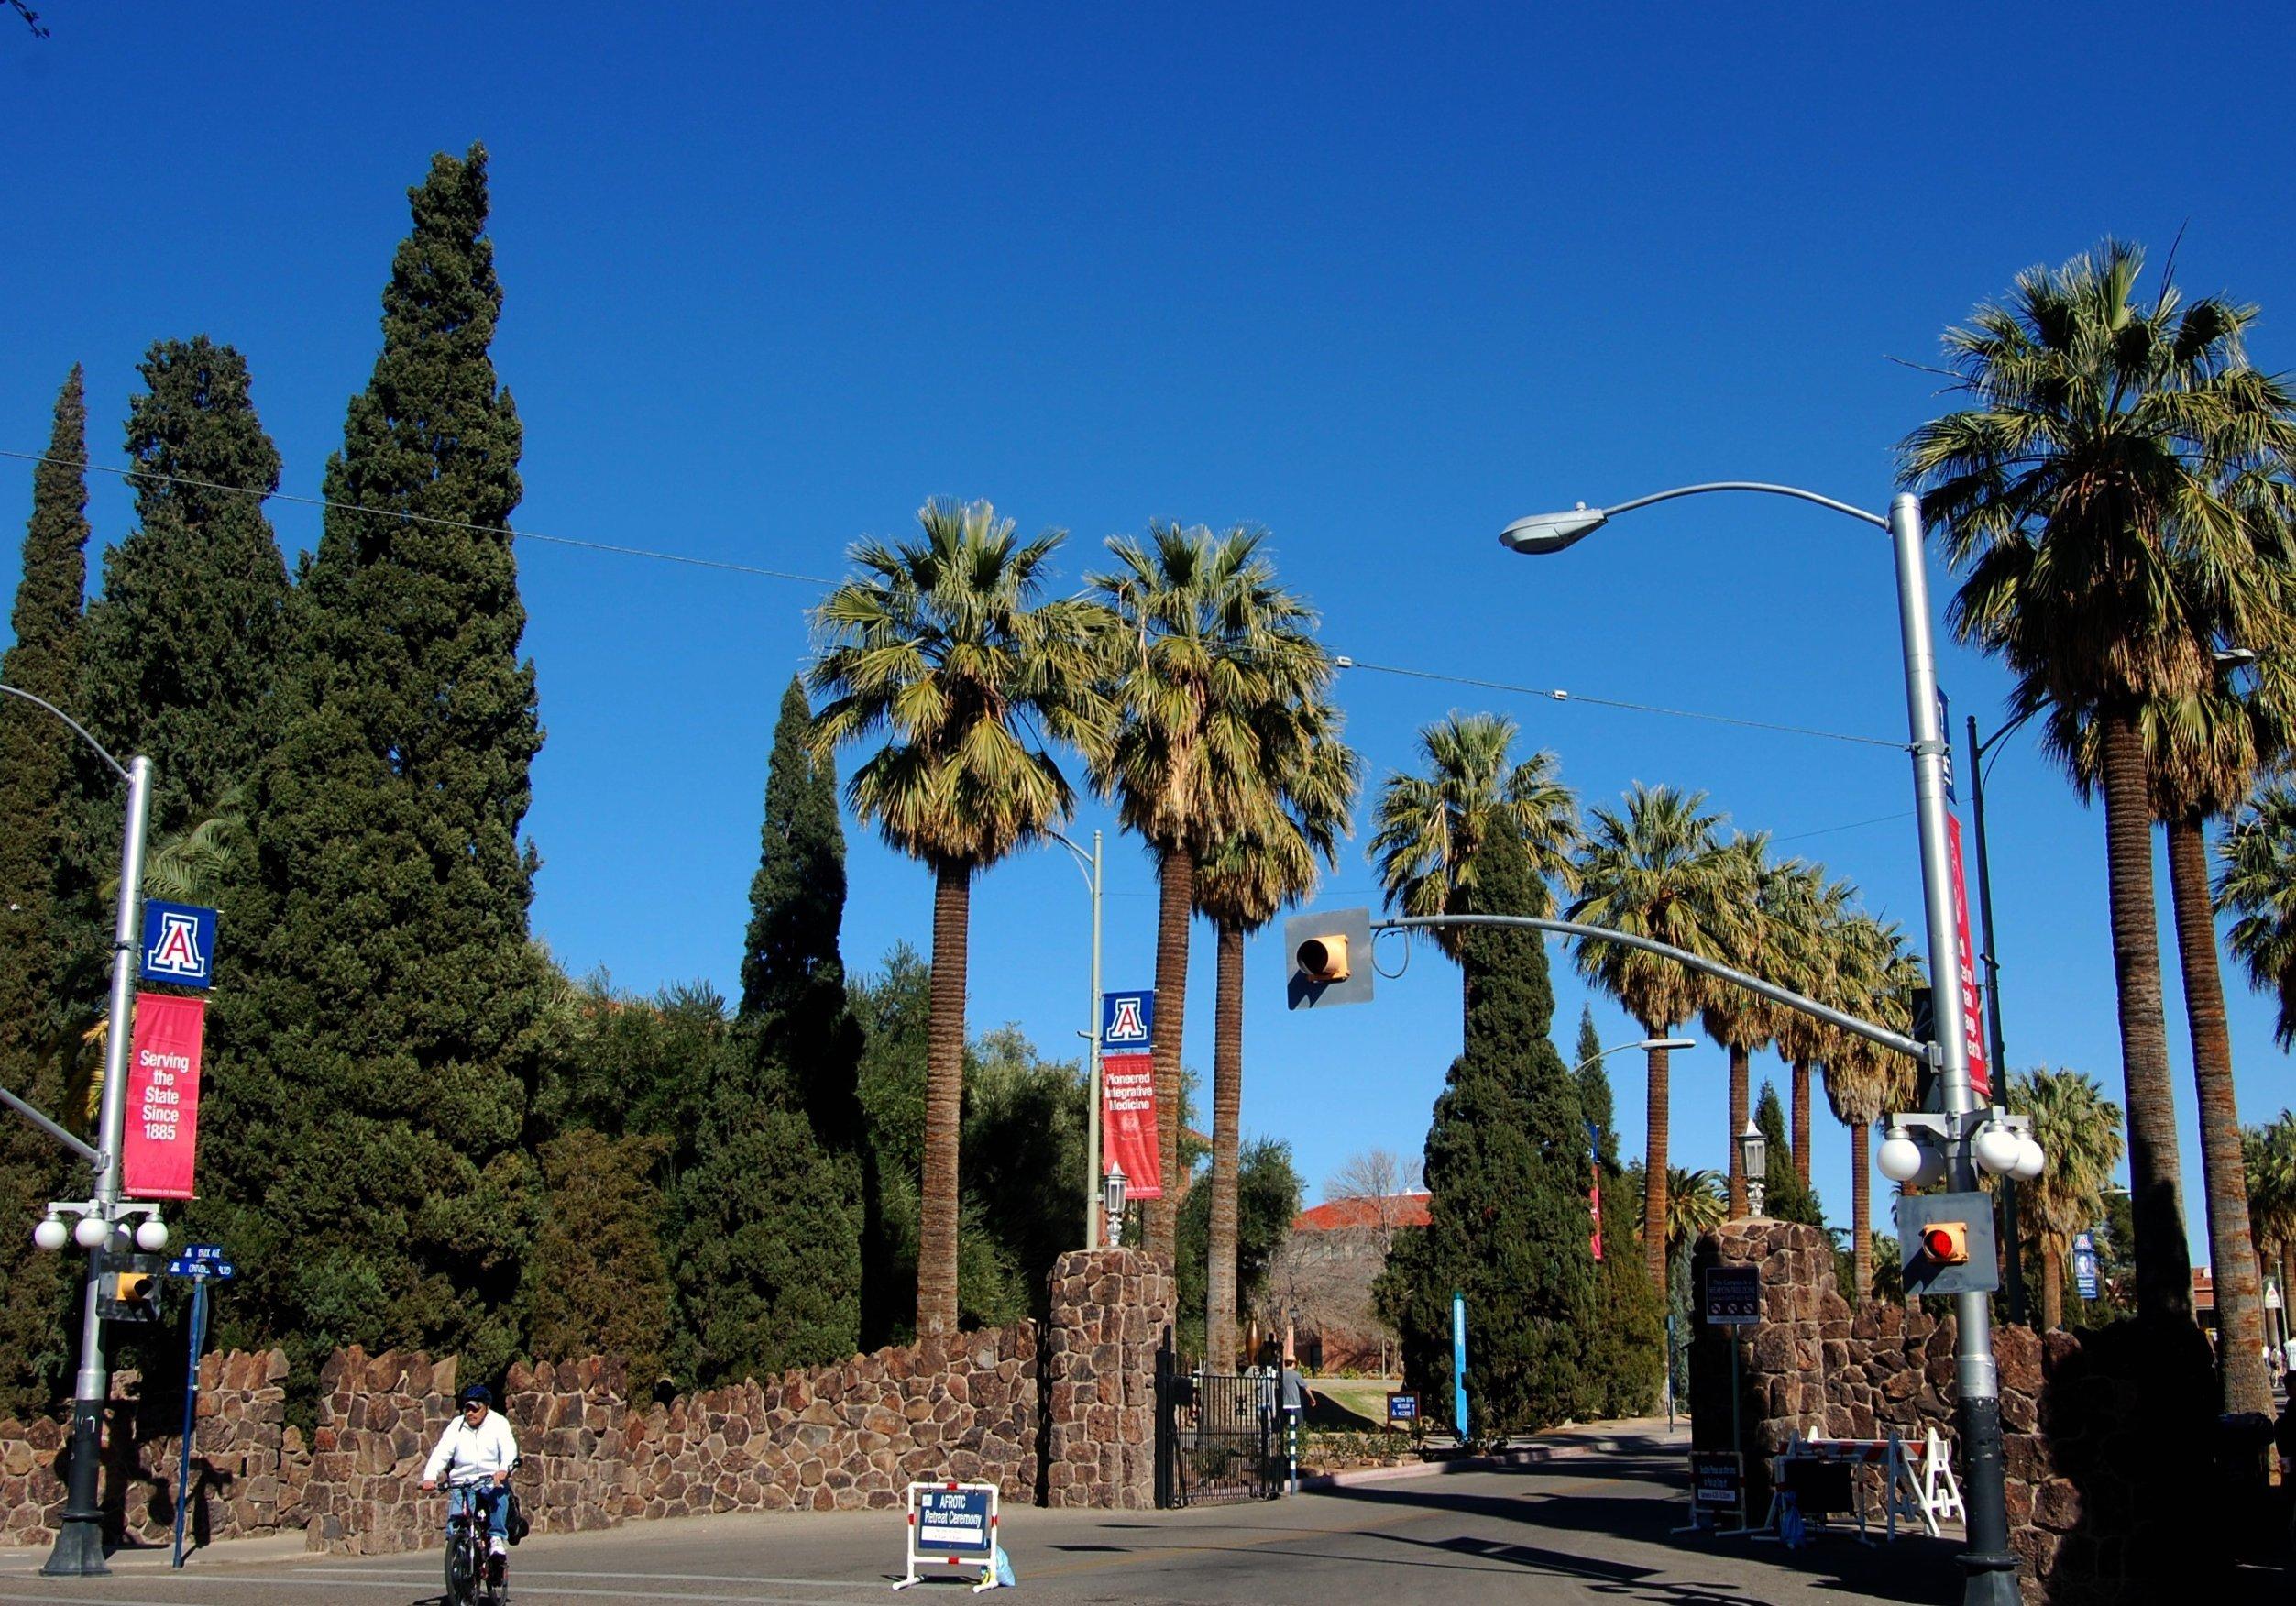 The University of Arizona Campus in Tucson